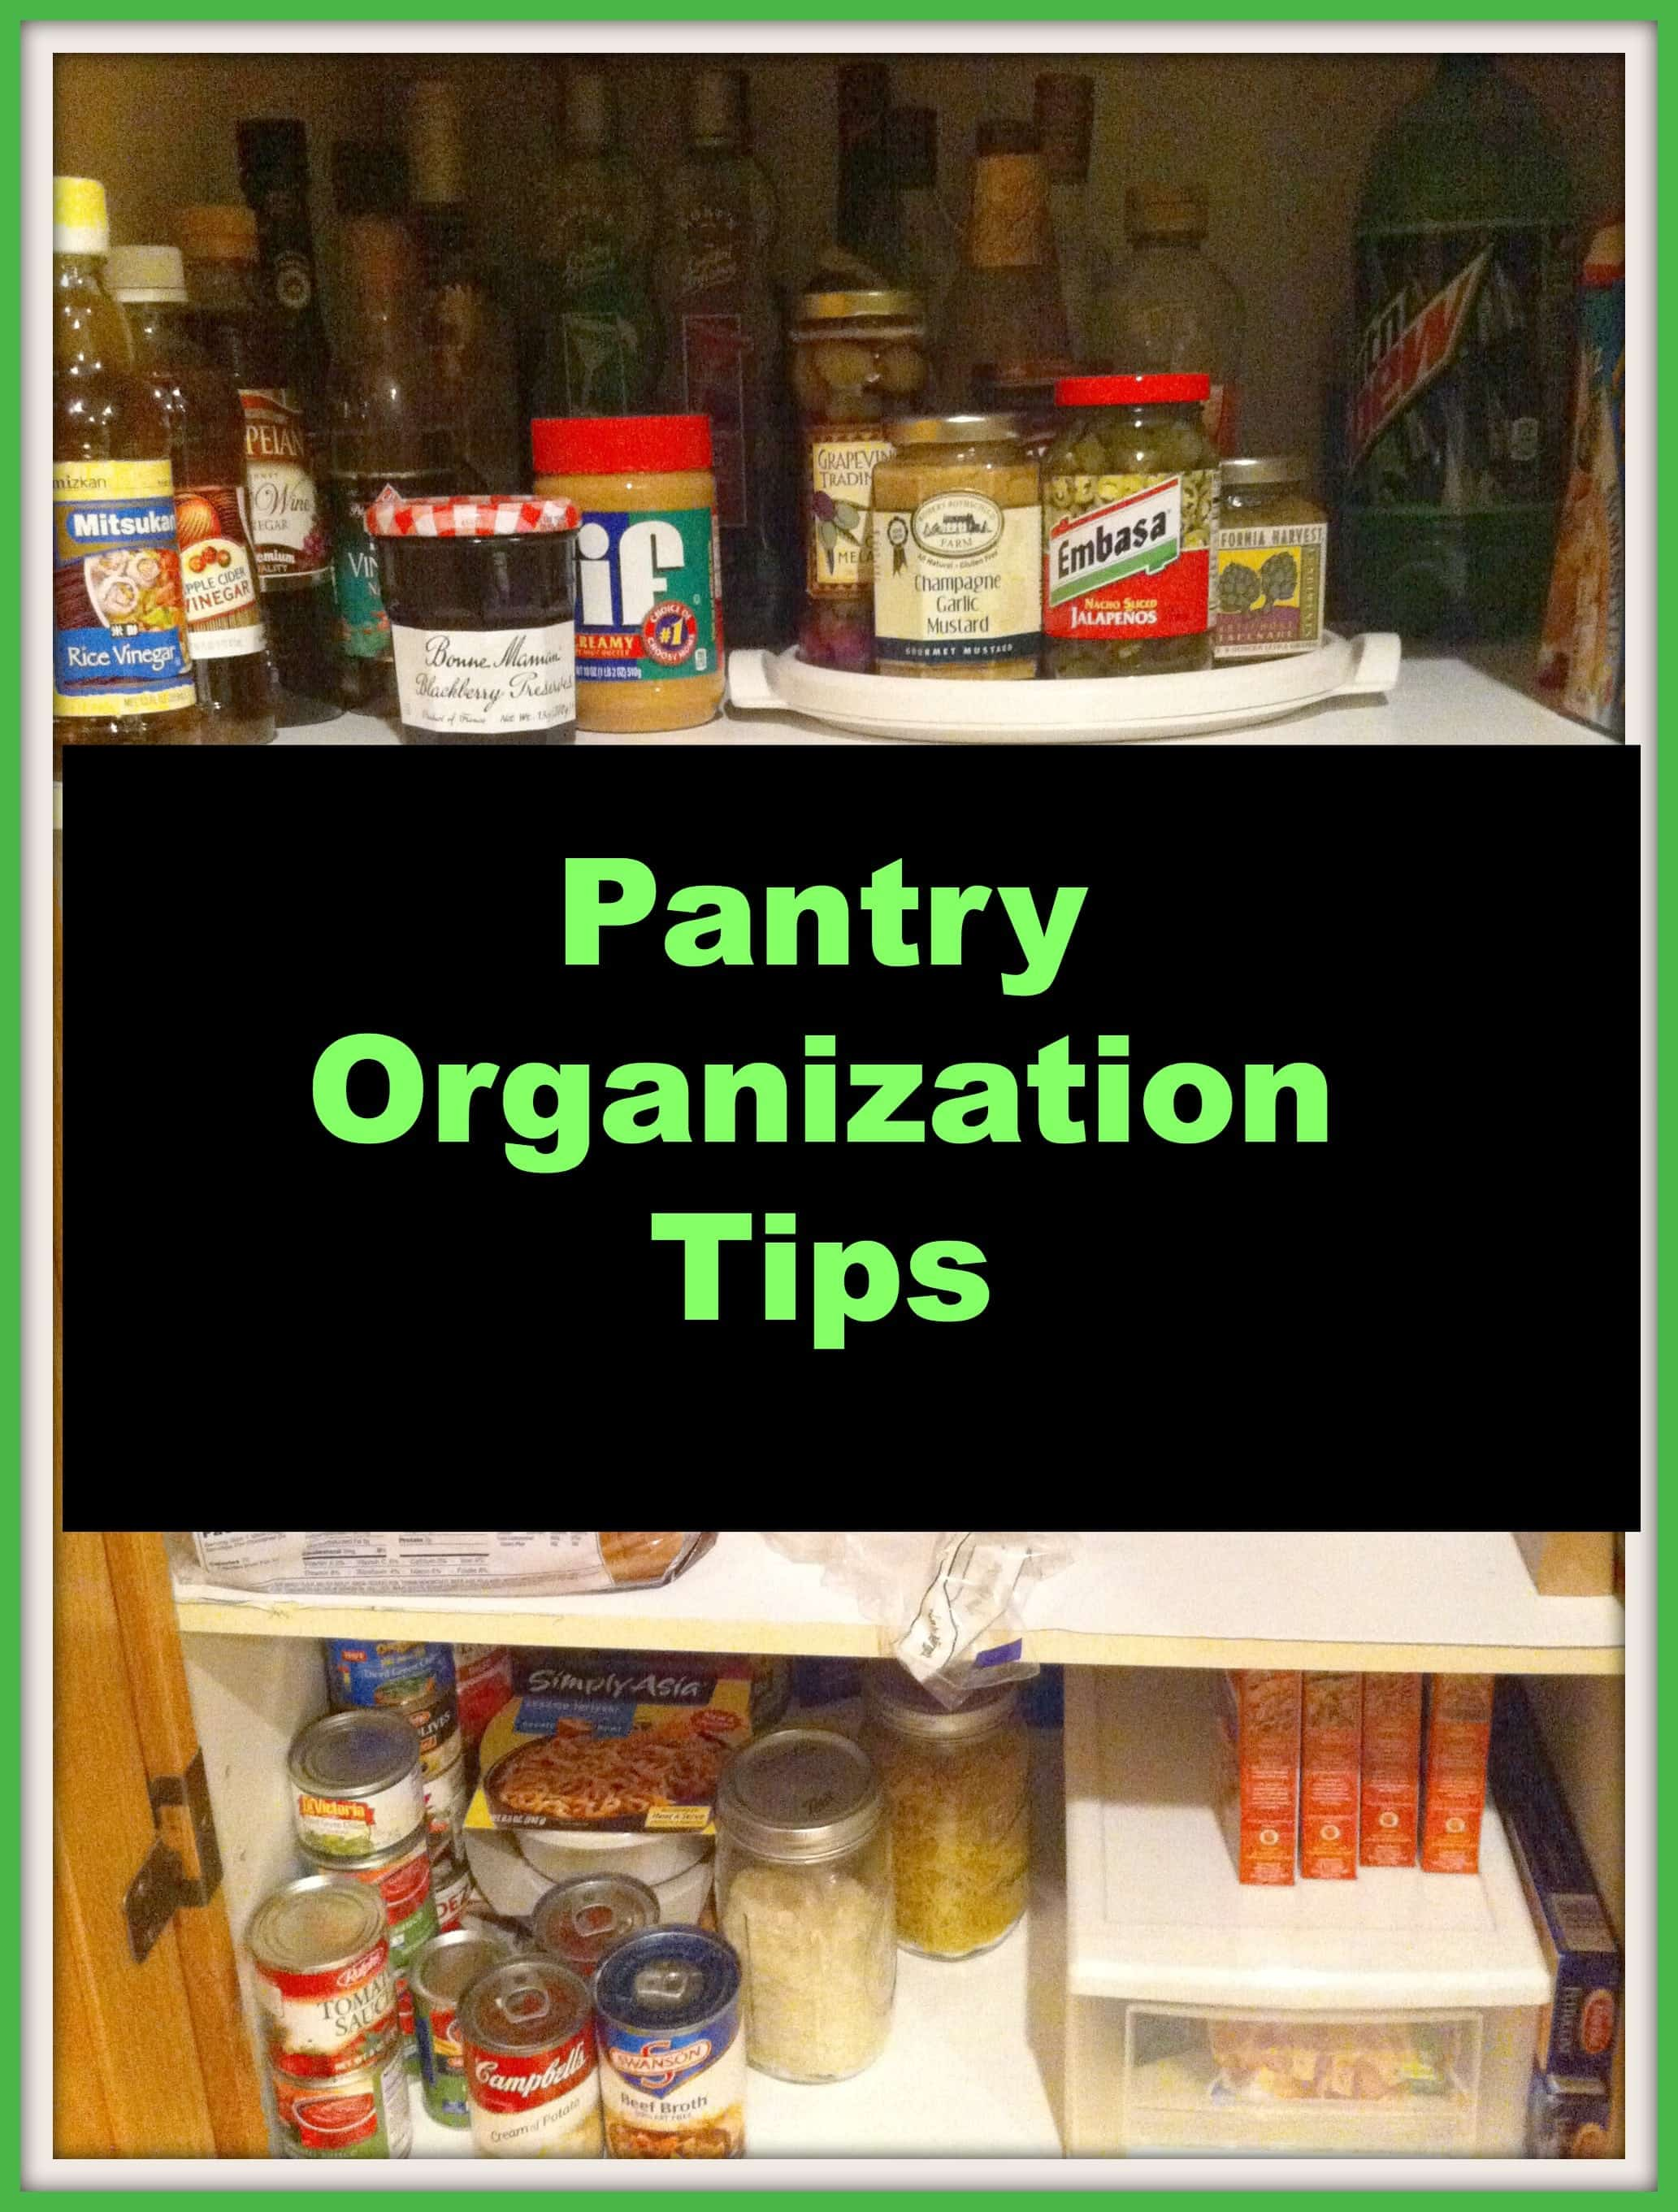 Pantry Ideas To Help You Organize Your Kitchen: Kitchen Pantry Organization